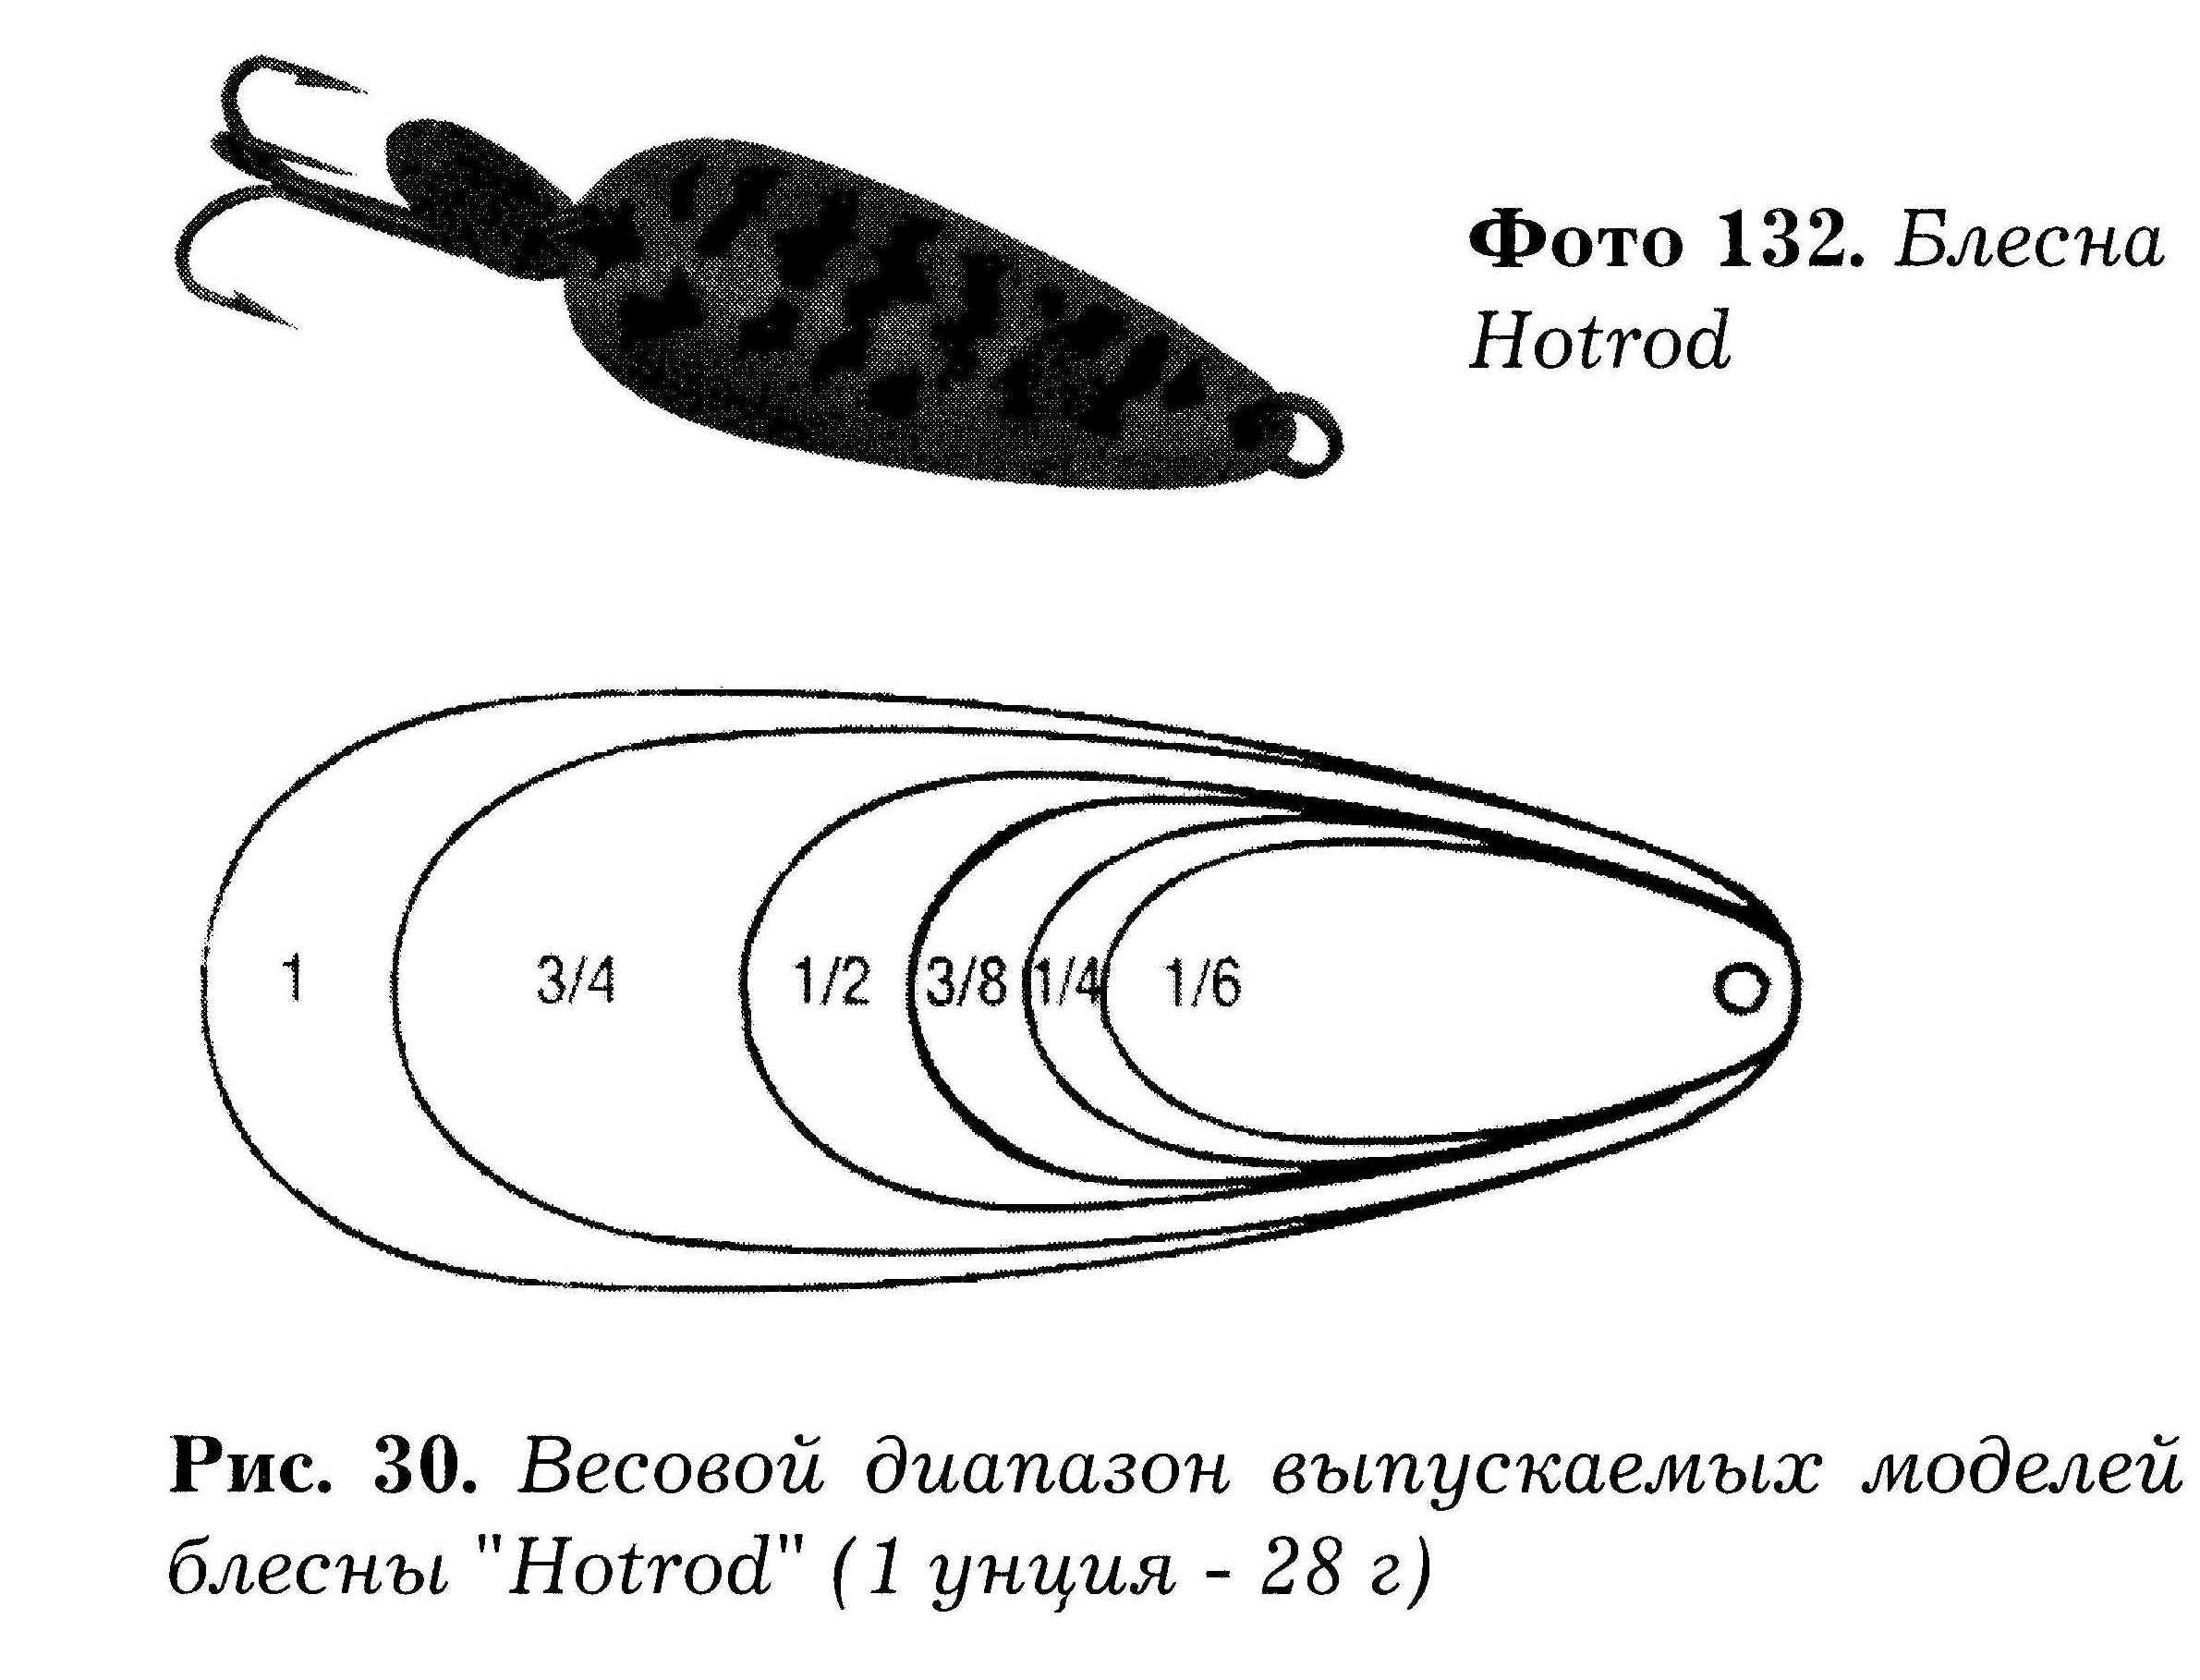 Чертежи воблеров с размерами — ловись рыбка